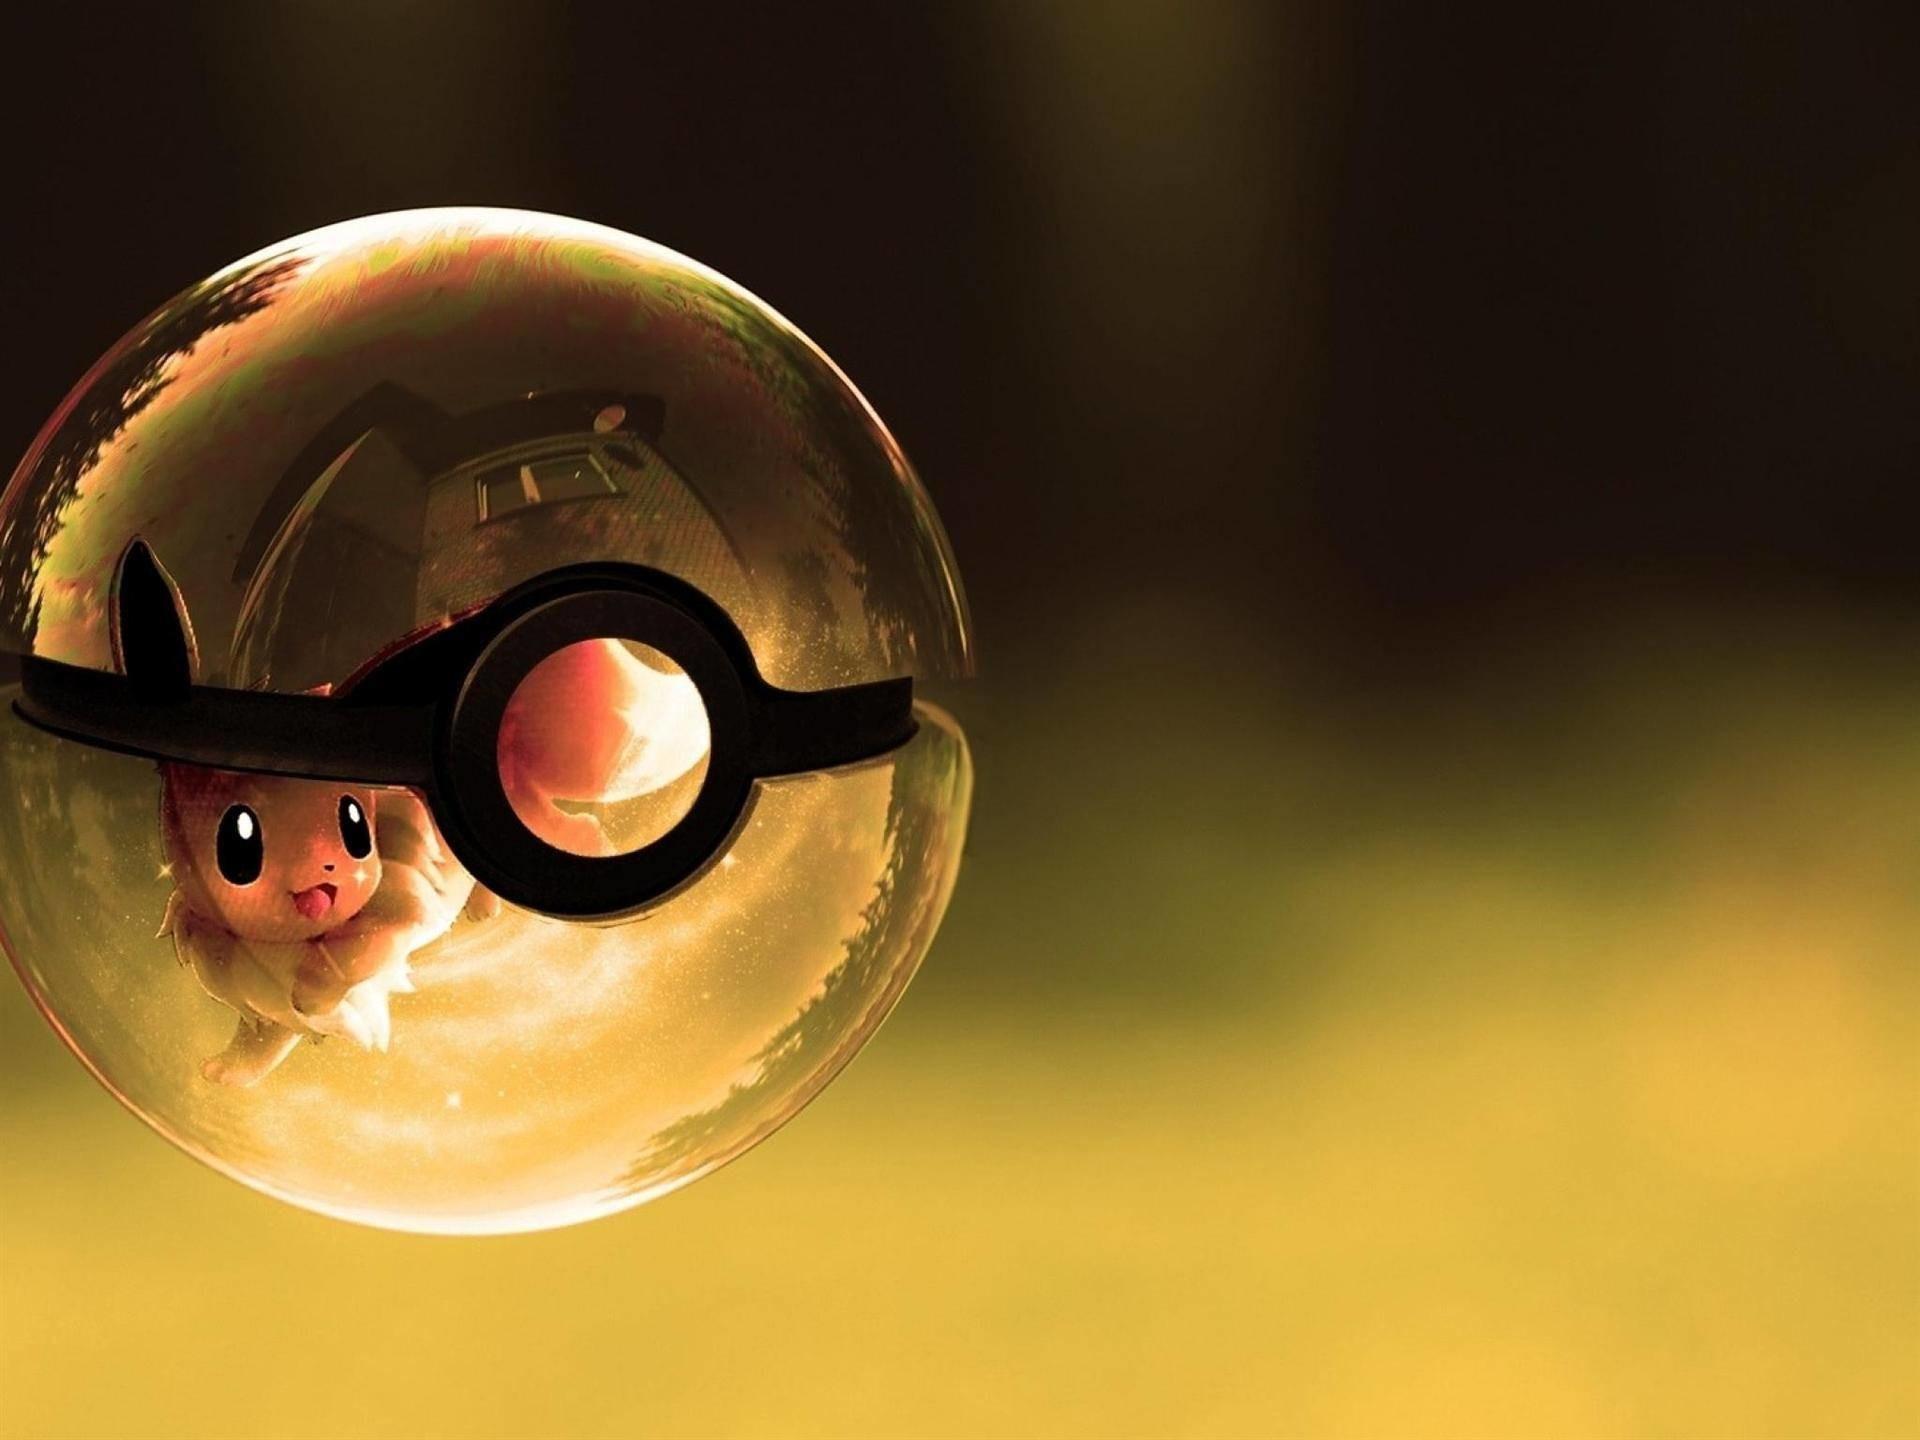 Res: 1920x1440, 1000+ ideas about Cute Pokemon Wallpaper on Pinterest | Pokemon